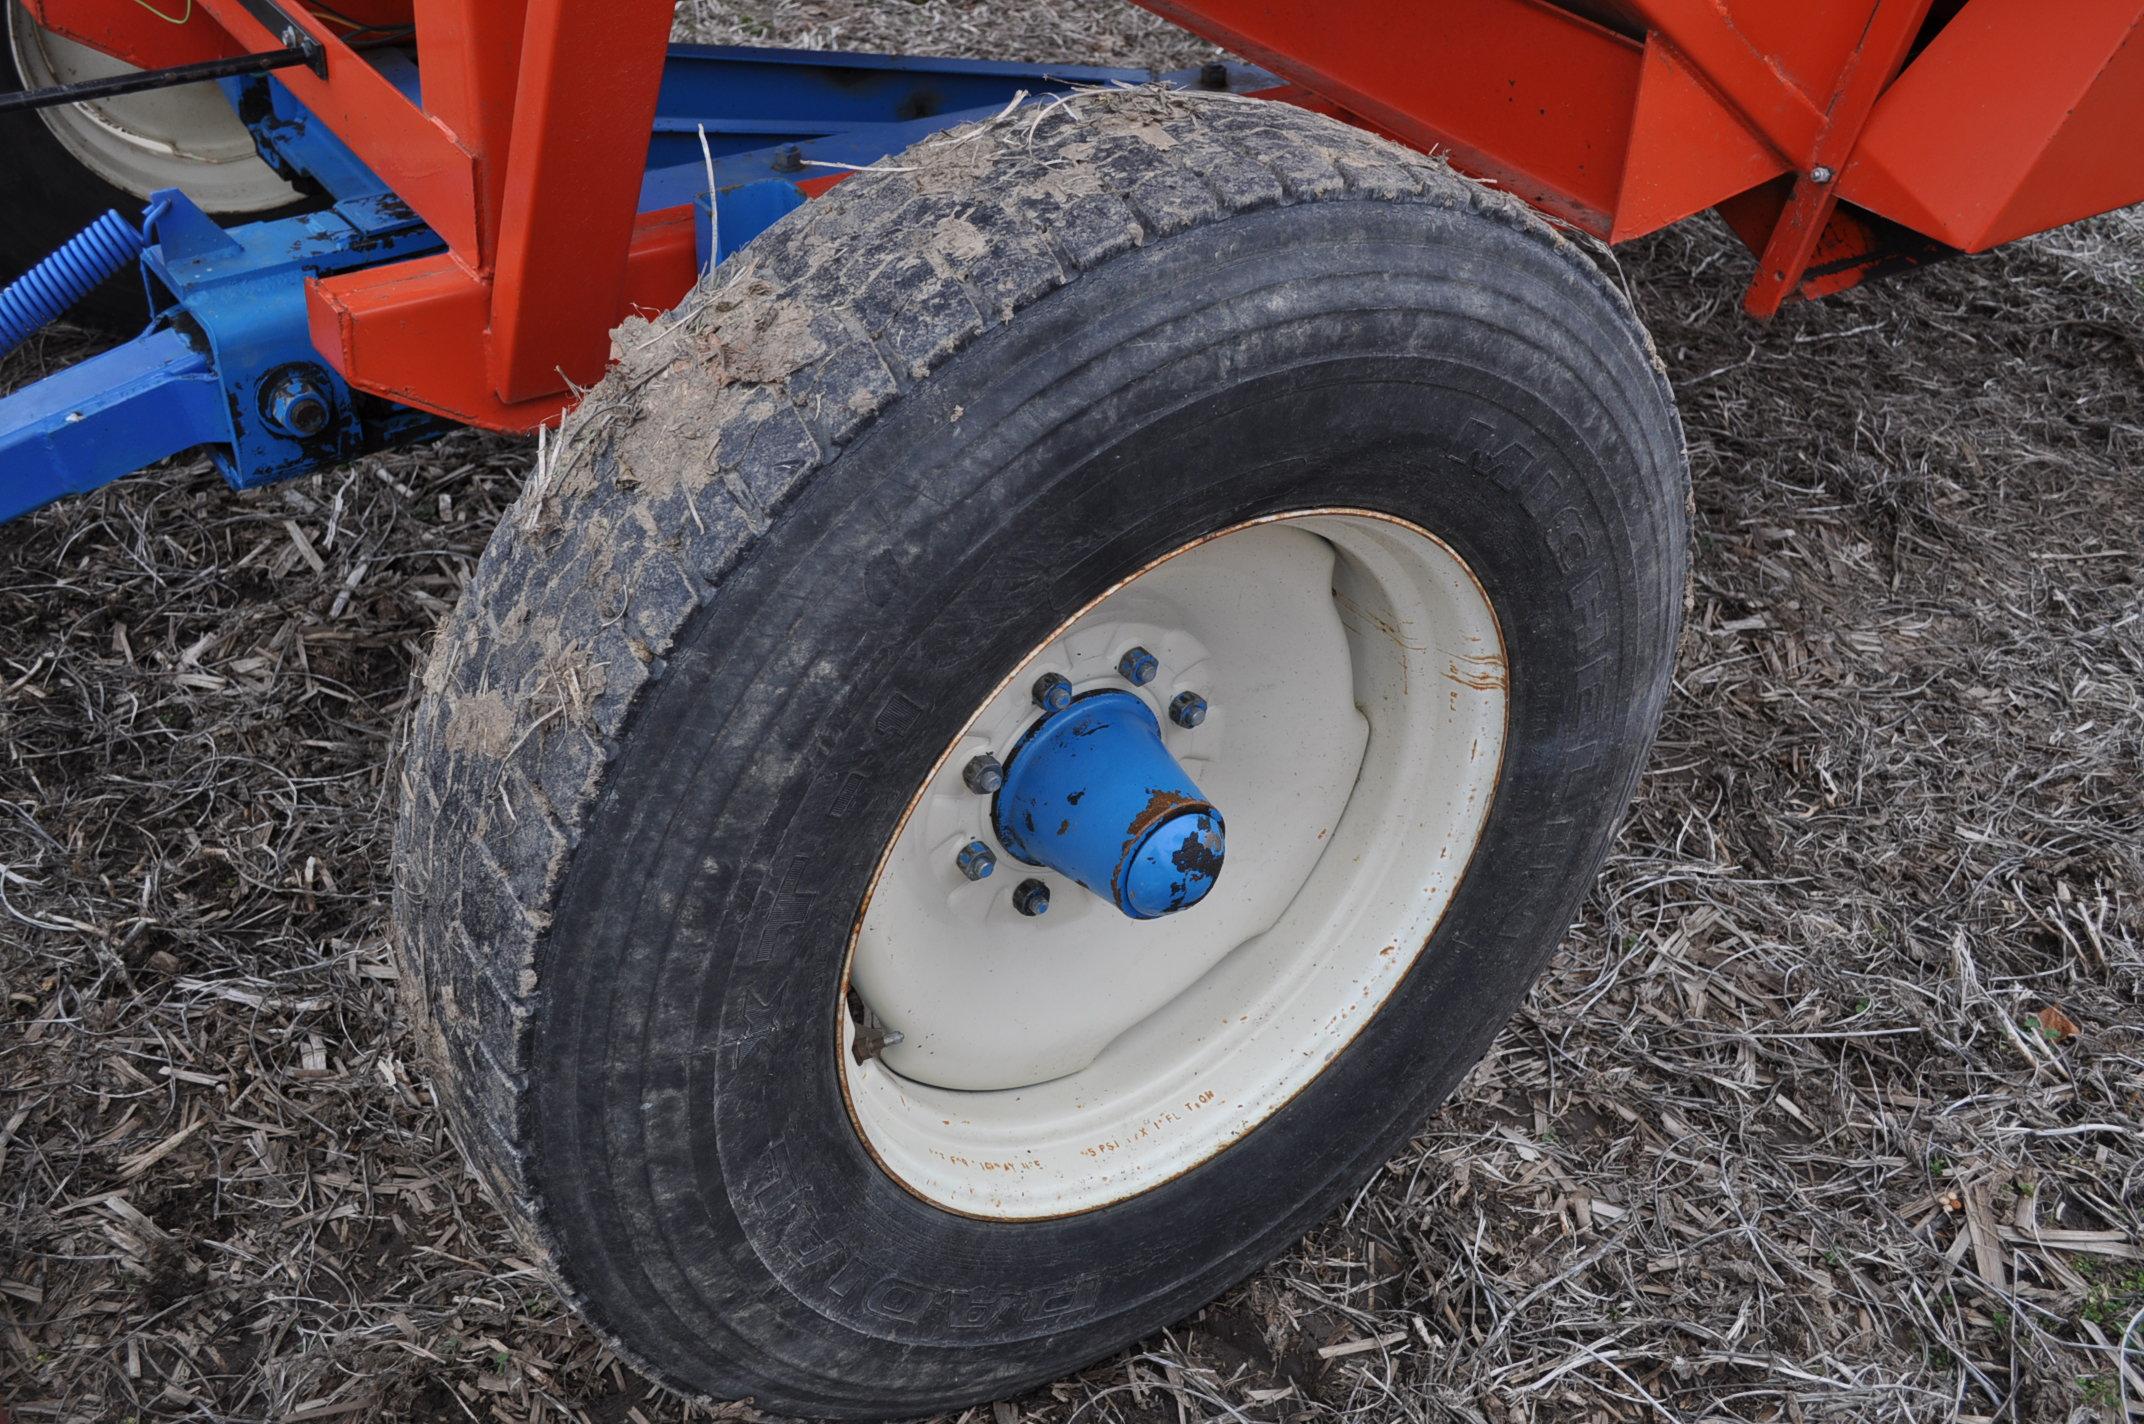 Killbros 385 gravity bed wagon, tarp, steel rails, Killbros 1386 gear, 11 R 22.5 tires - Image 6 of 7